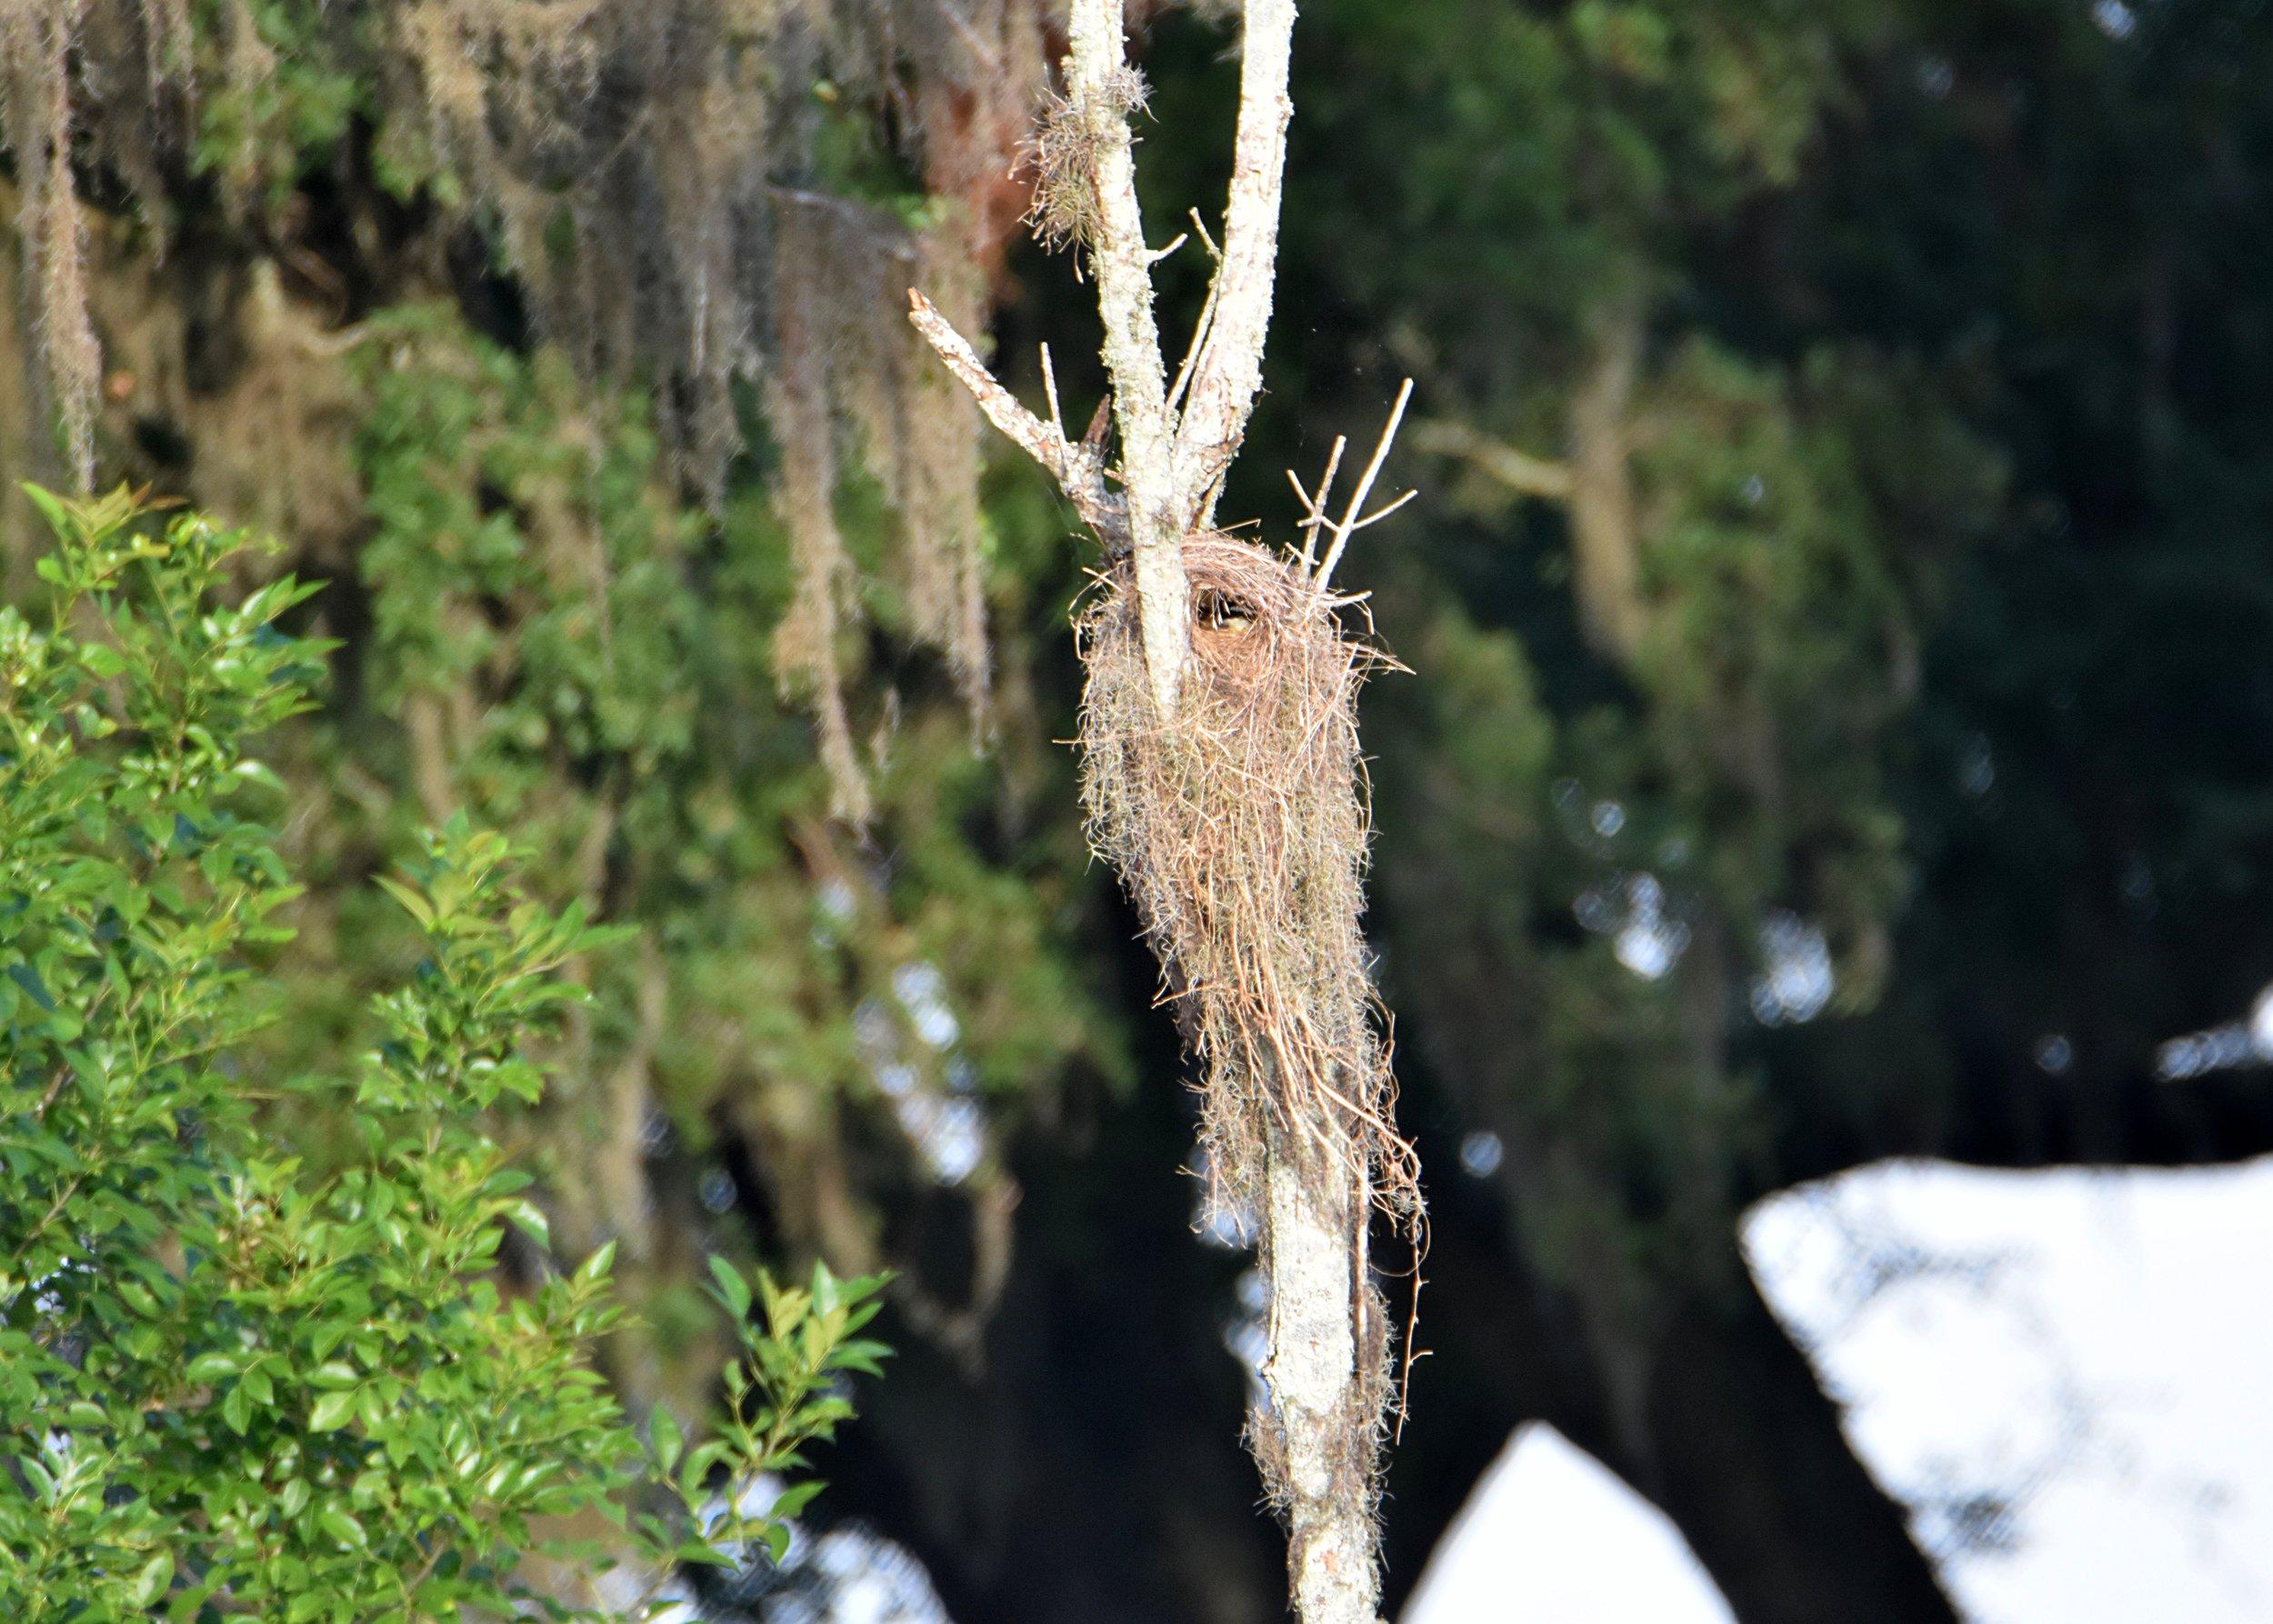 A Great Kiskadee inside its nest.